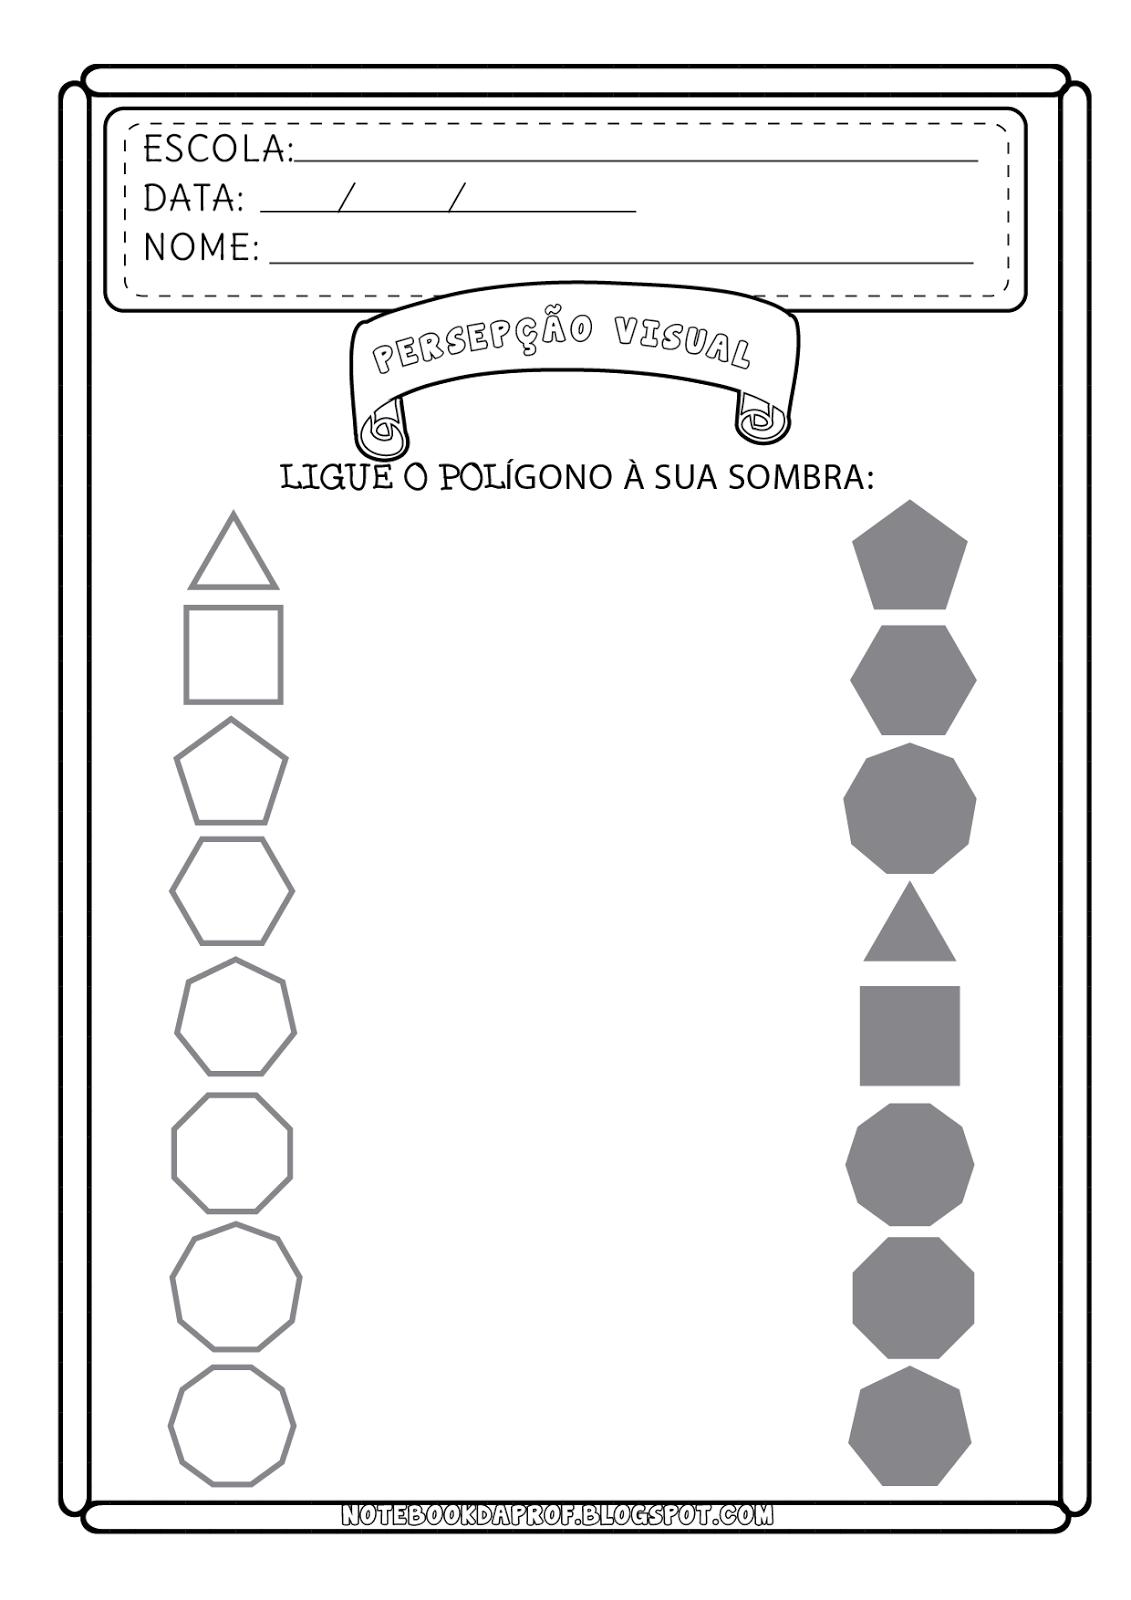 Fichas Percepção Visual - Nível médio   imprimir   Pinterest ...